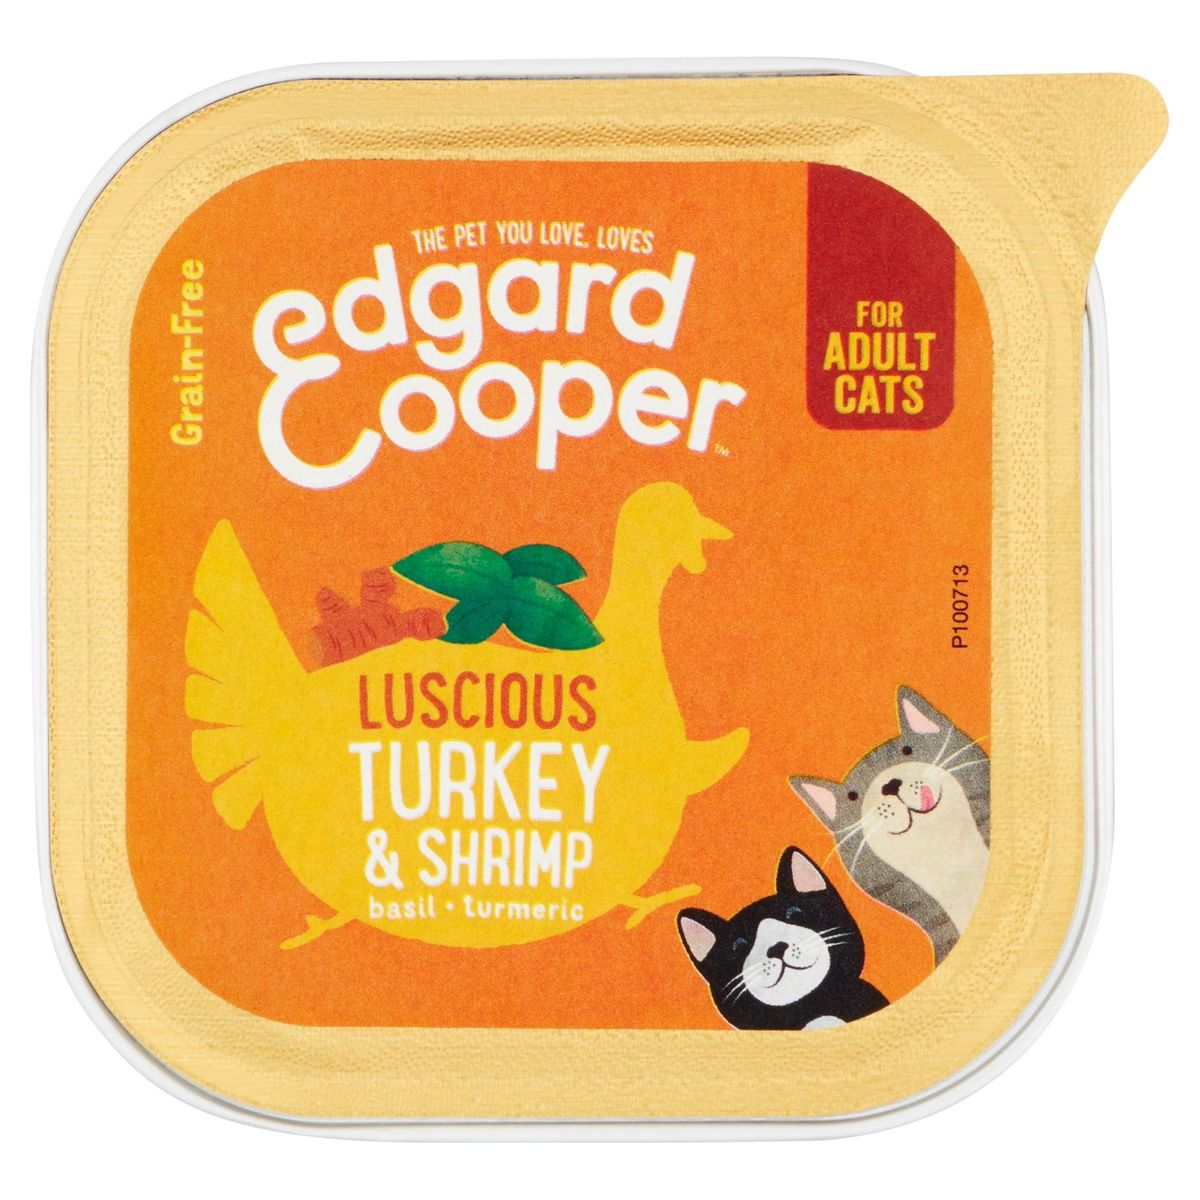 Edgard & Cooper Luscious Turkey & Shrimp Basil Turmeric 85 g